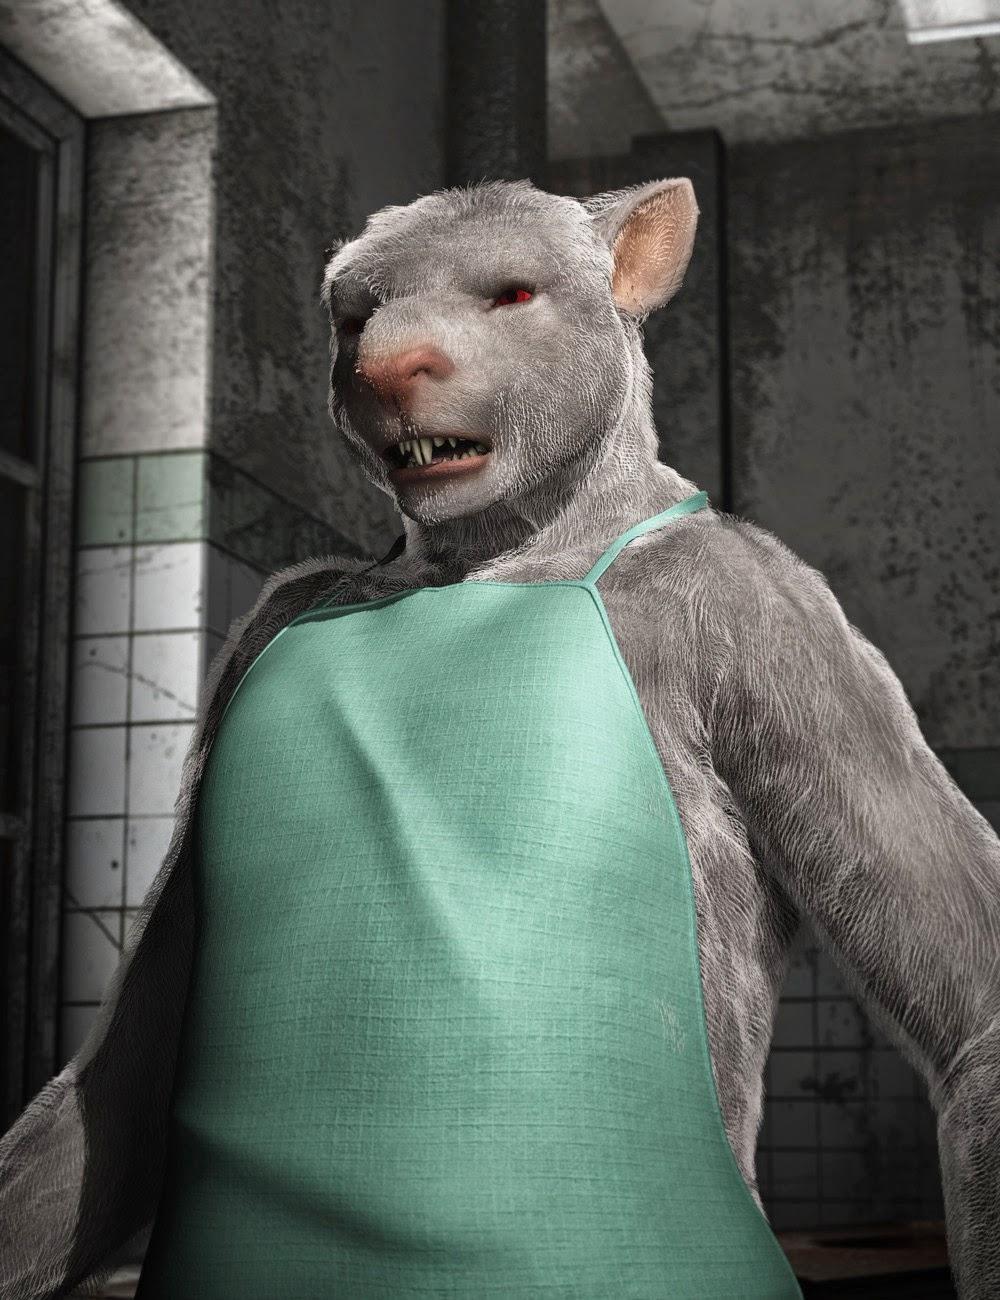 Street Rat - The Rat Man